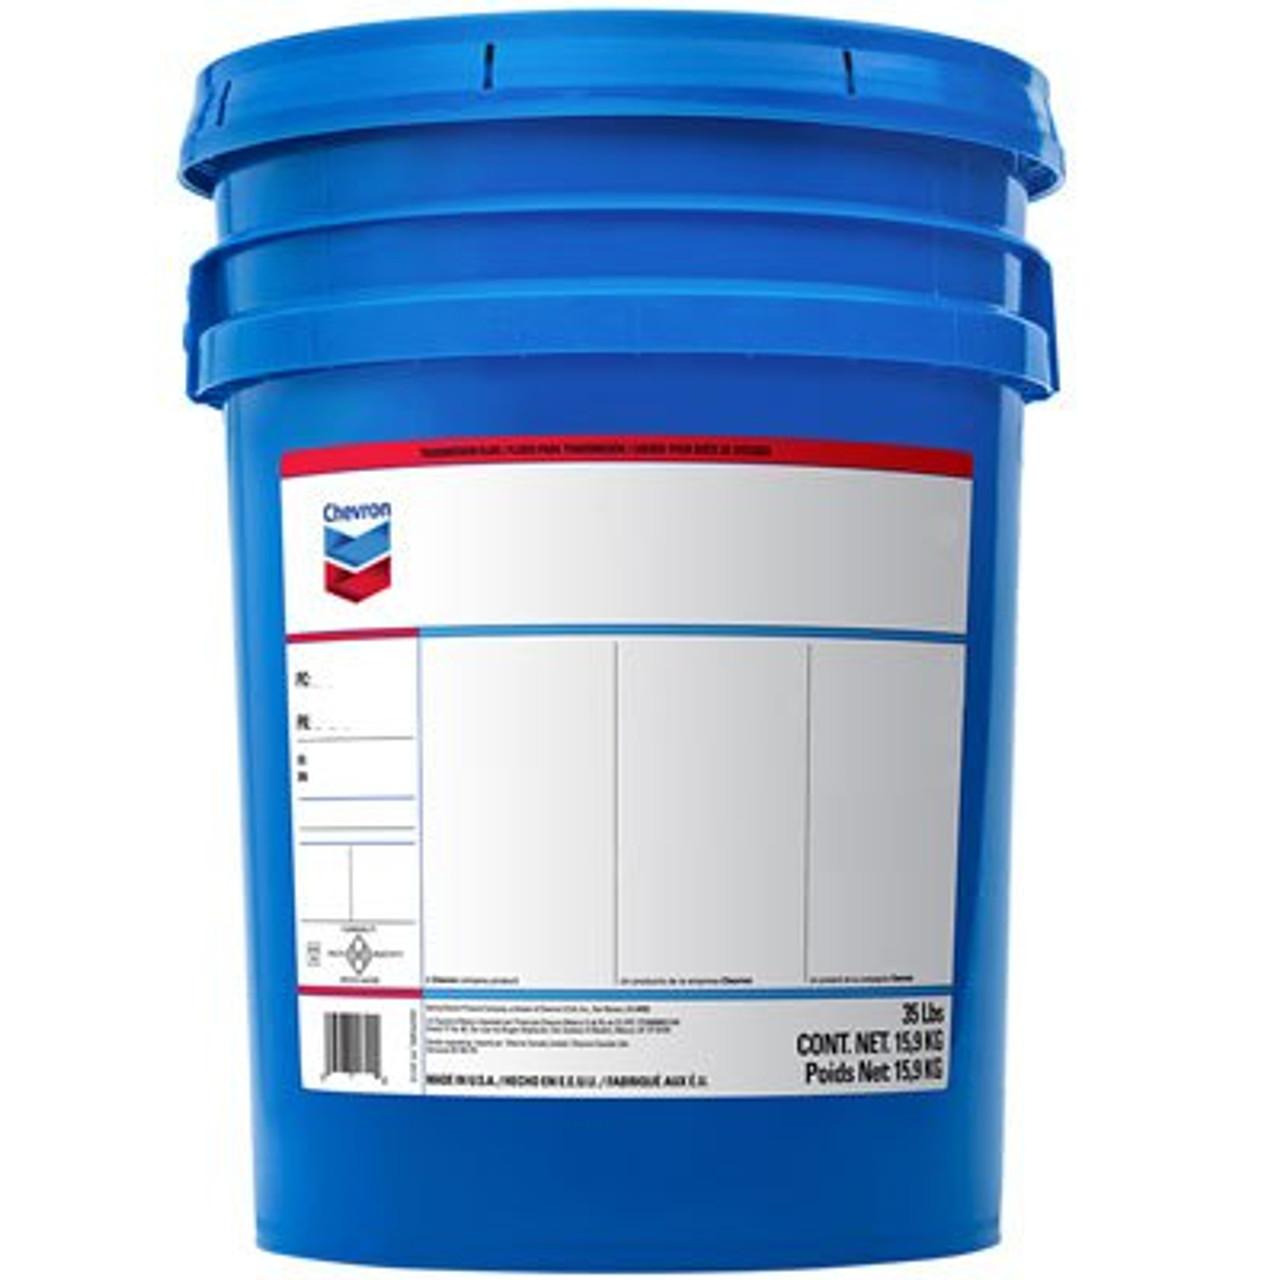 Chevron Cetus® HiPerSYN® 150 Synthetic Compressor Oil - 5 Gallon Pail